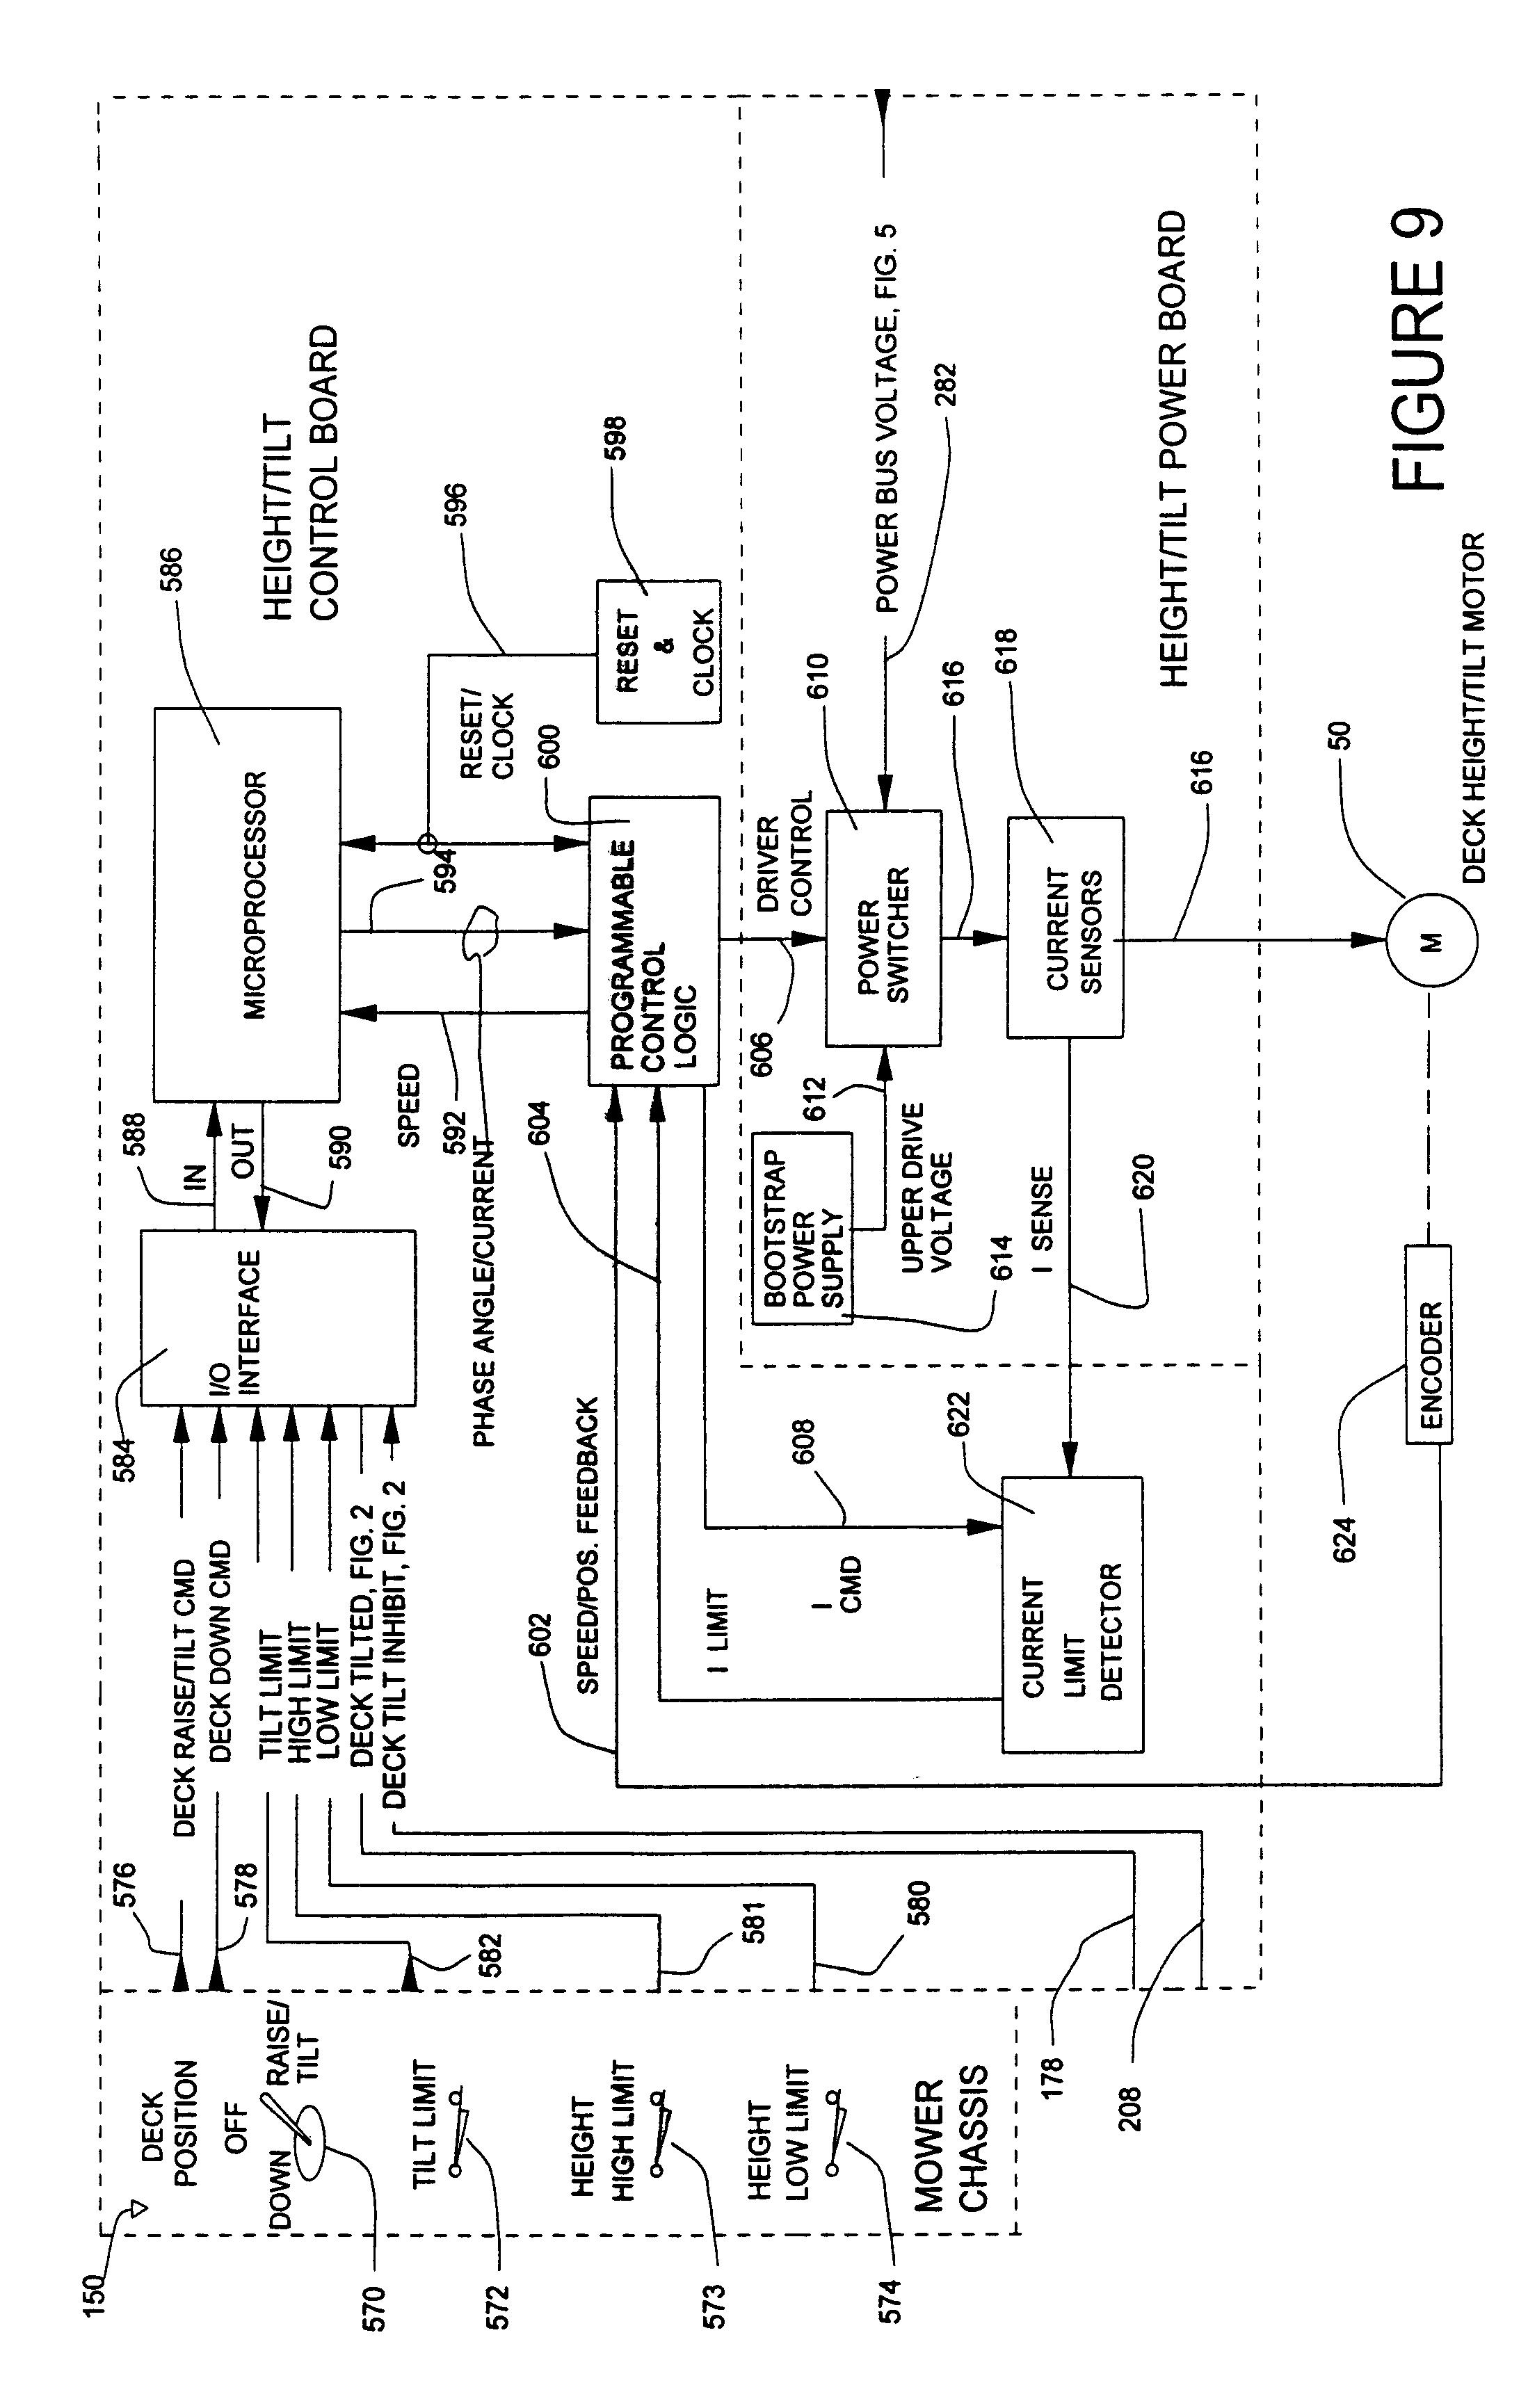 Onan Ignition Coil Wiring additionally US6591593 besides Honda Generator Parts Diagram together with Wiring Diagram For Kohler 22 Hp Engine likewise Ld Modelo De Carta Poder. on troy bilt generator wiring diagram